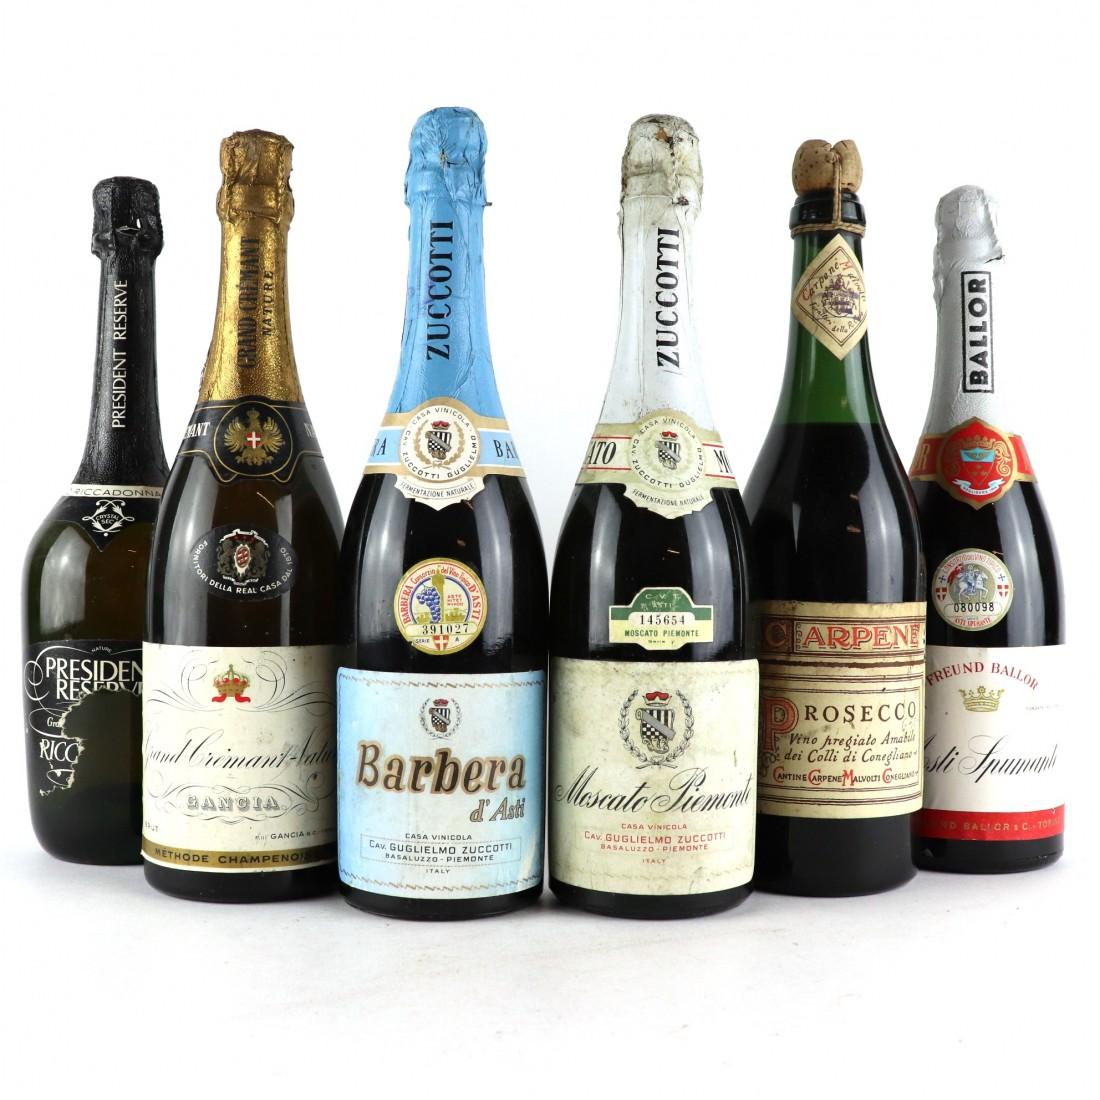 Isolare La Casa Basaluzzo assorted italian sparkling wines / 6 bottles | wine auctioneer